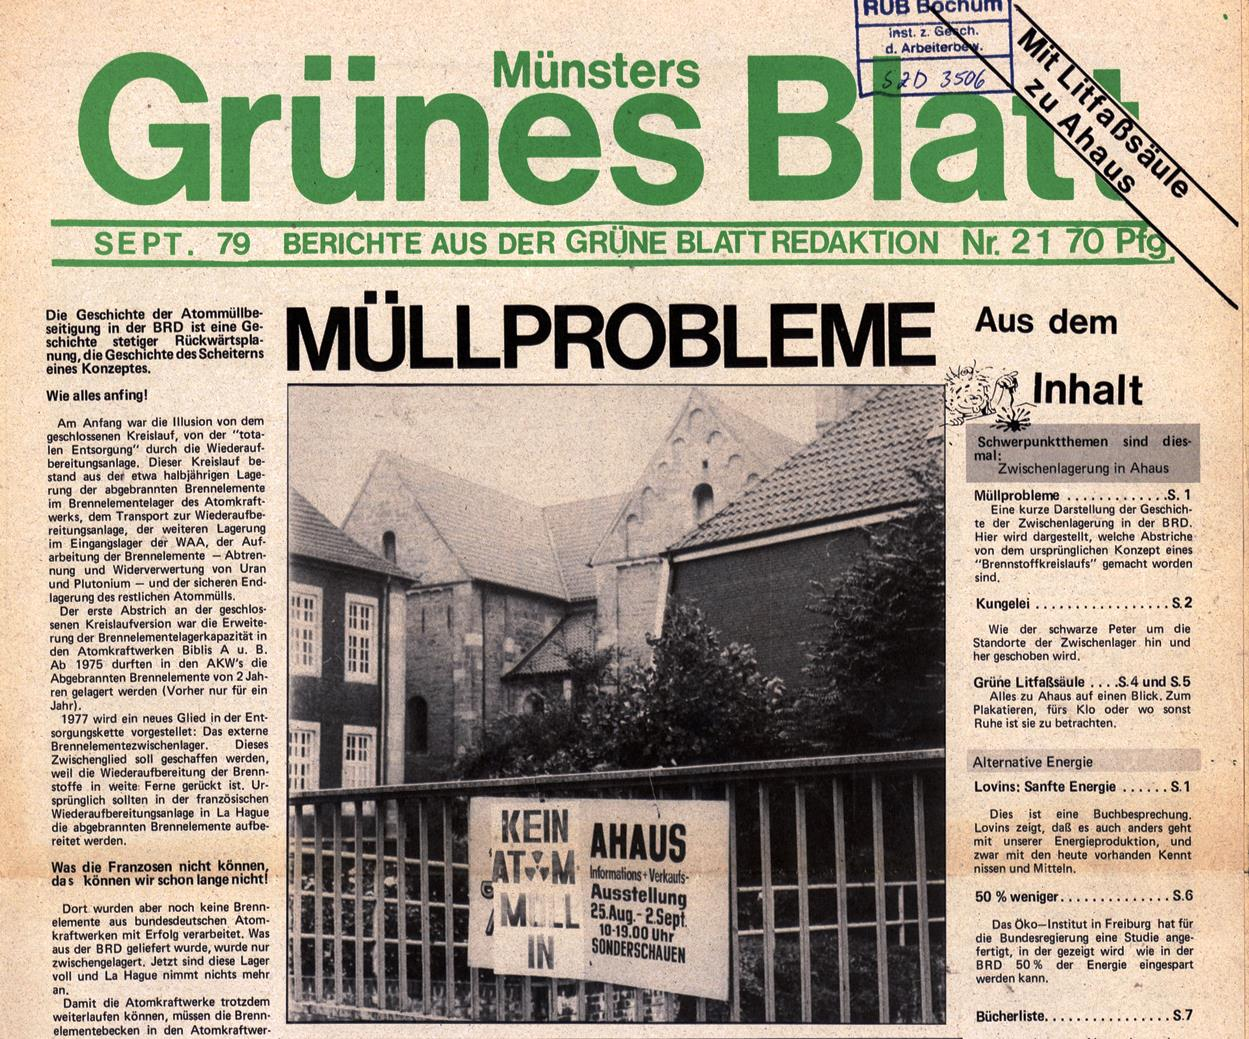 Muenster_Gruenes_Blatt_19790900_021_001